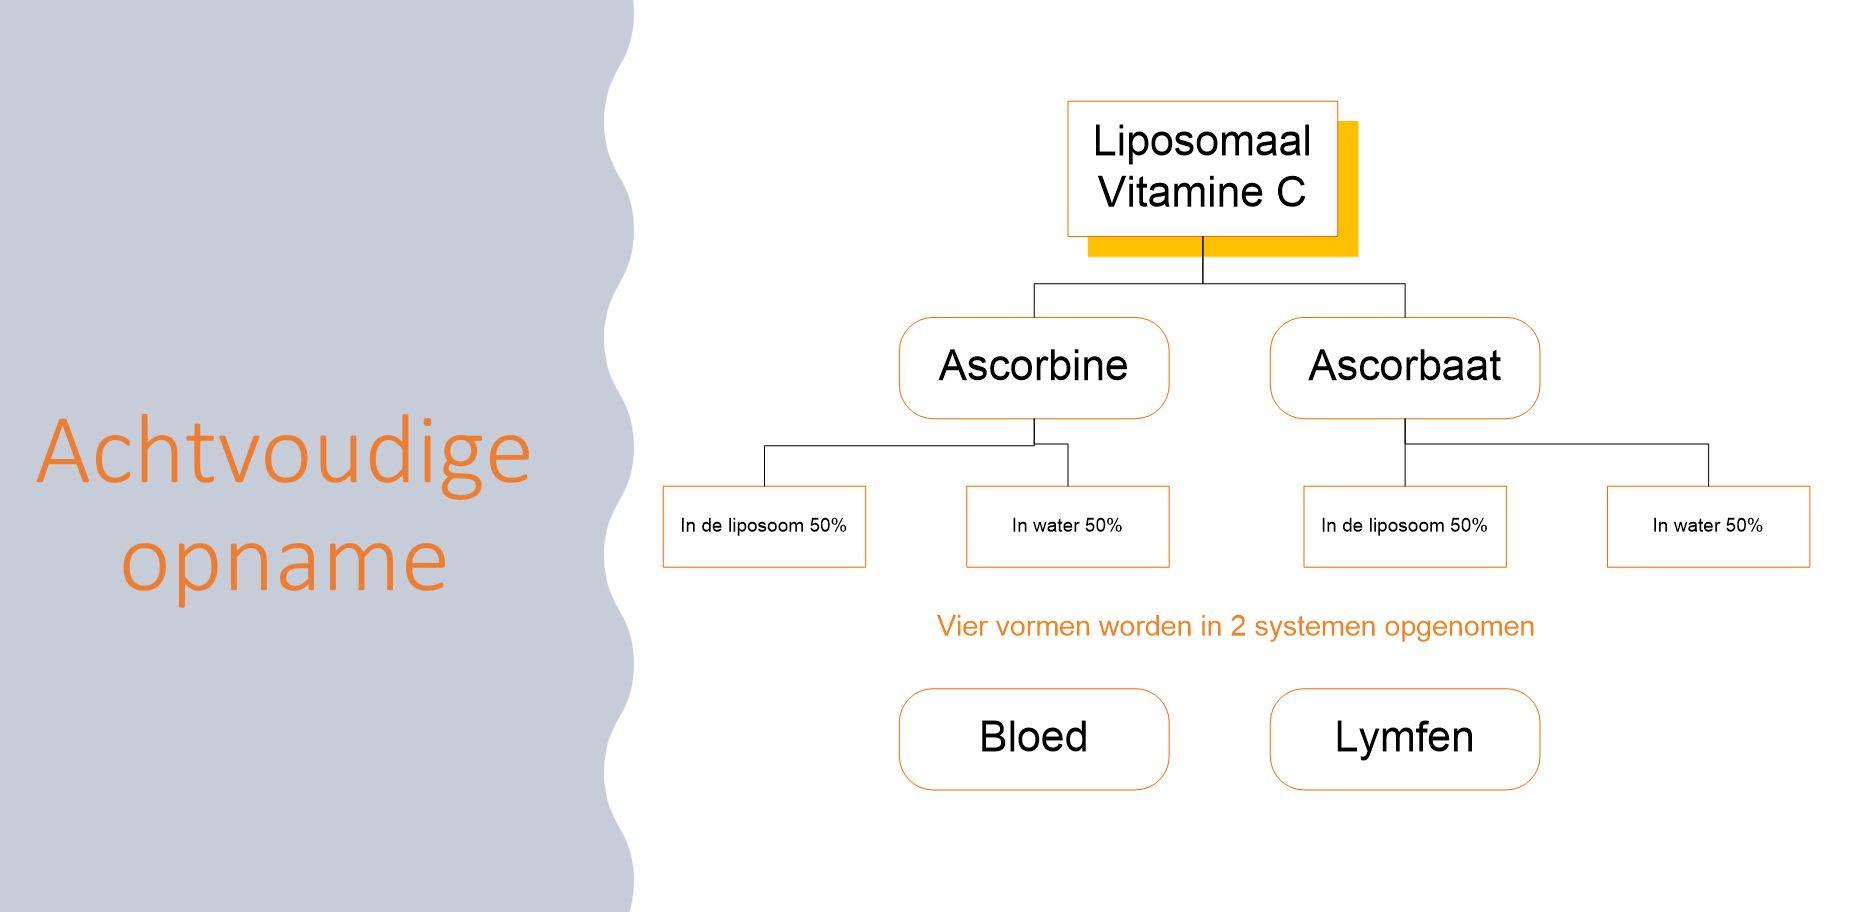 liposomaal vitamine C kopen